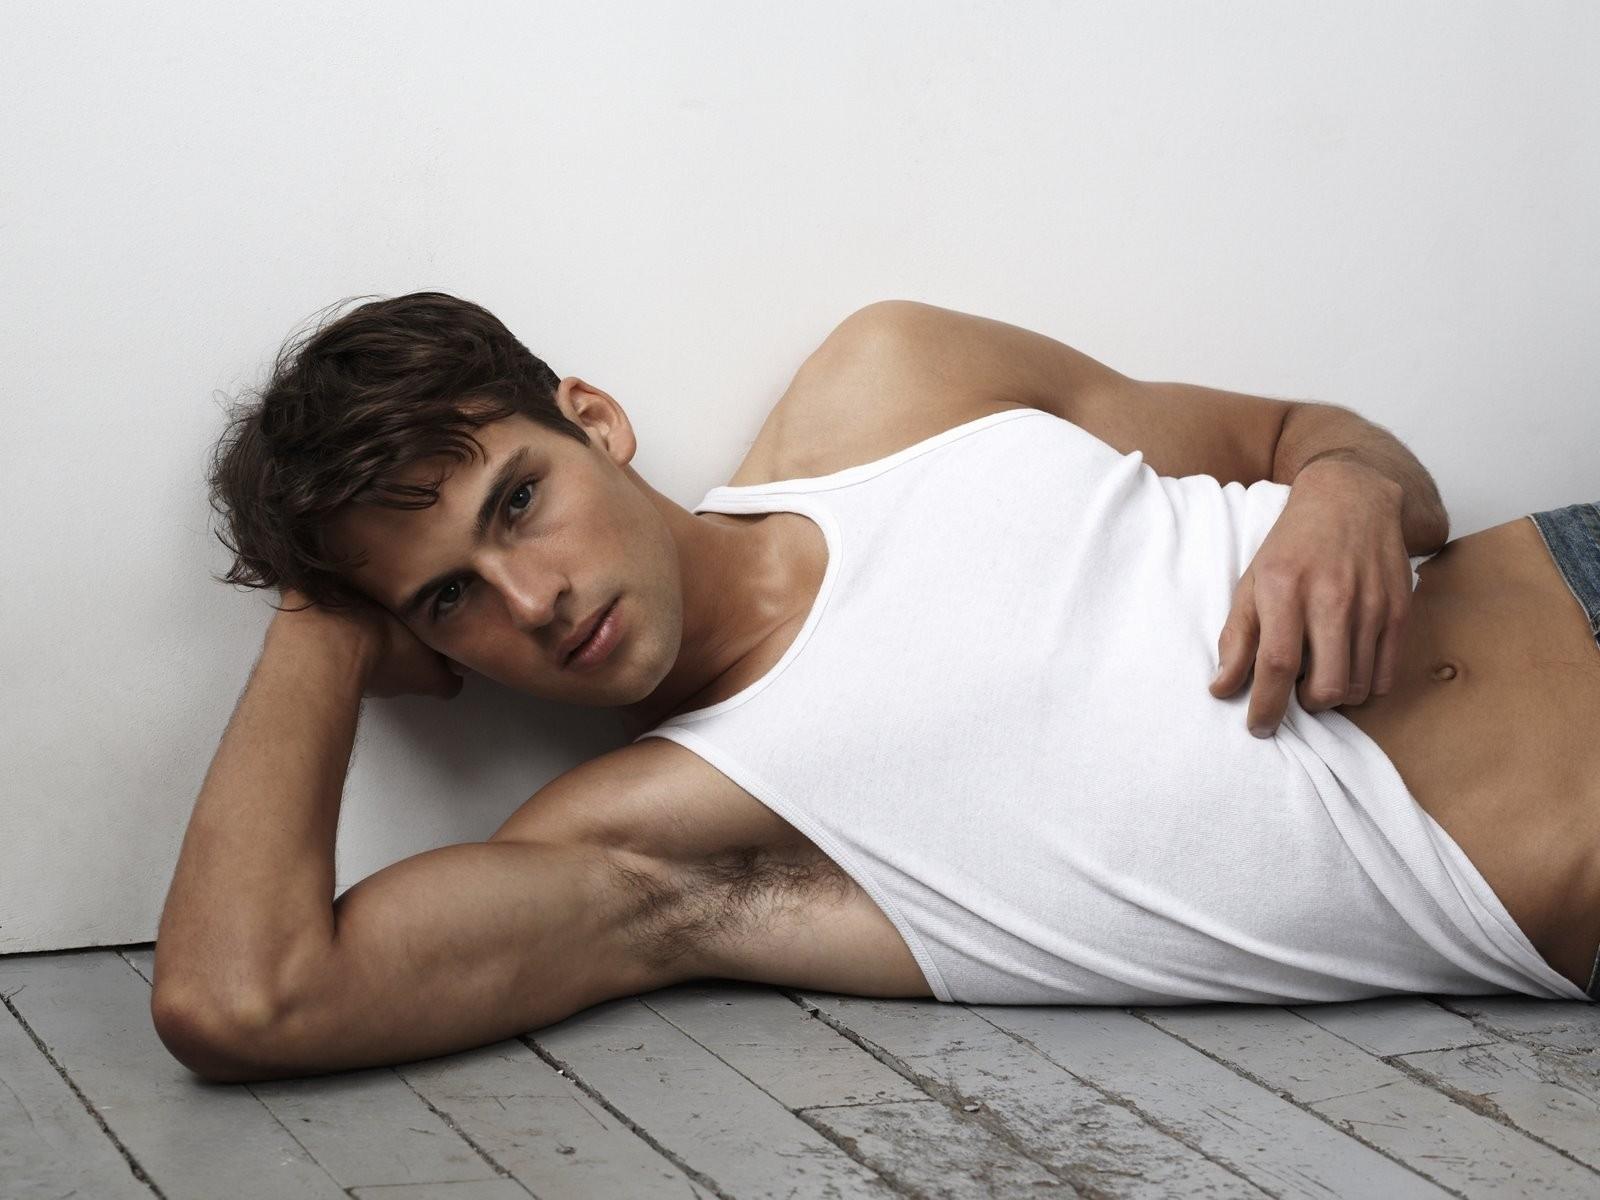 Wallpaper  Model, T Shirt, Joint, Girl, Beauty, Man, Body, Muscle, Neck, Arm, Lying -9623